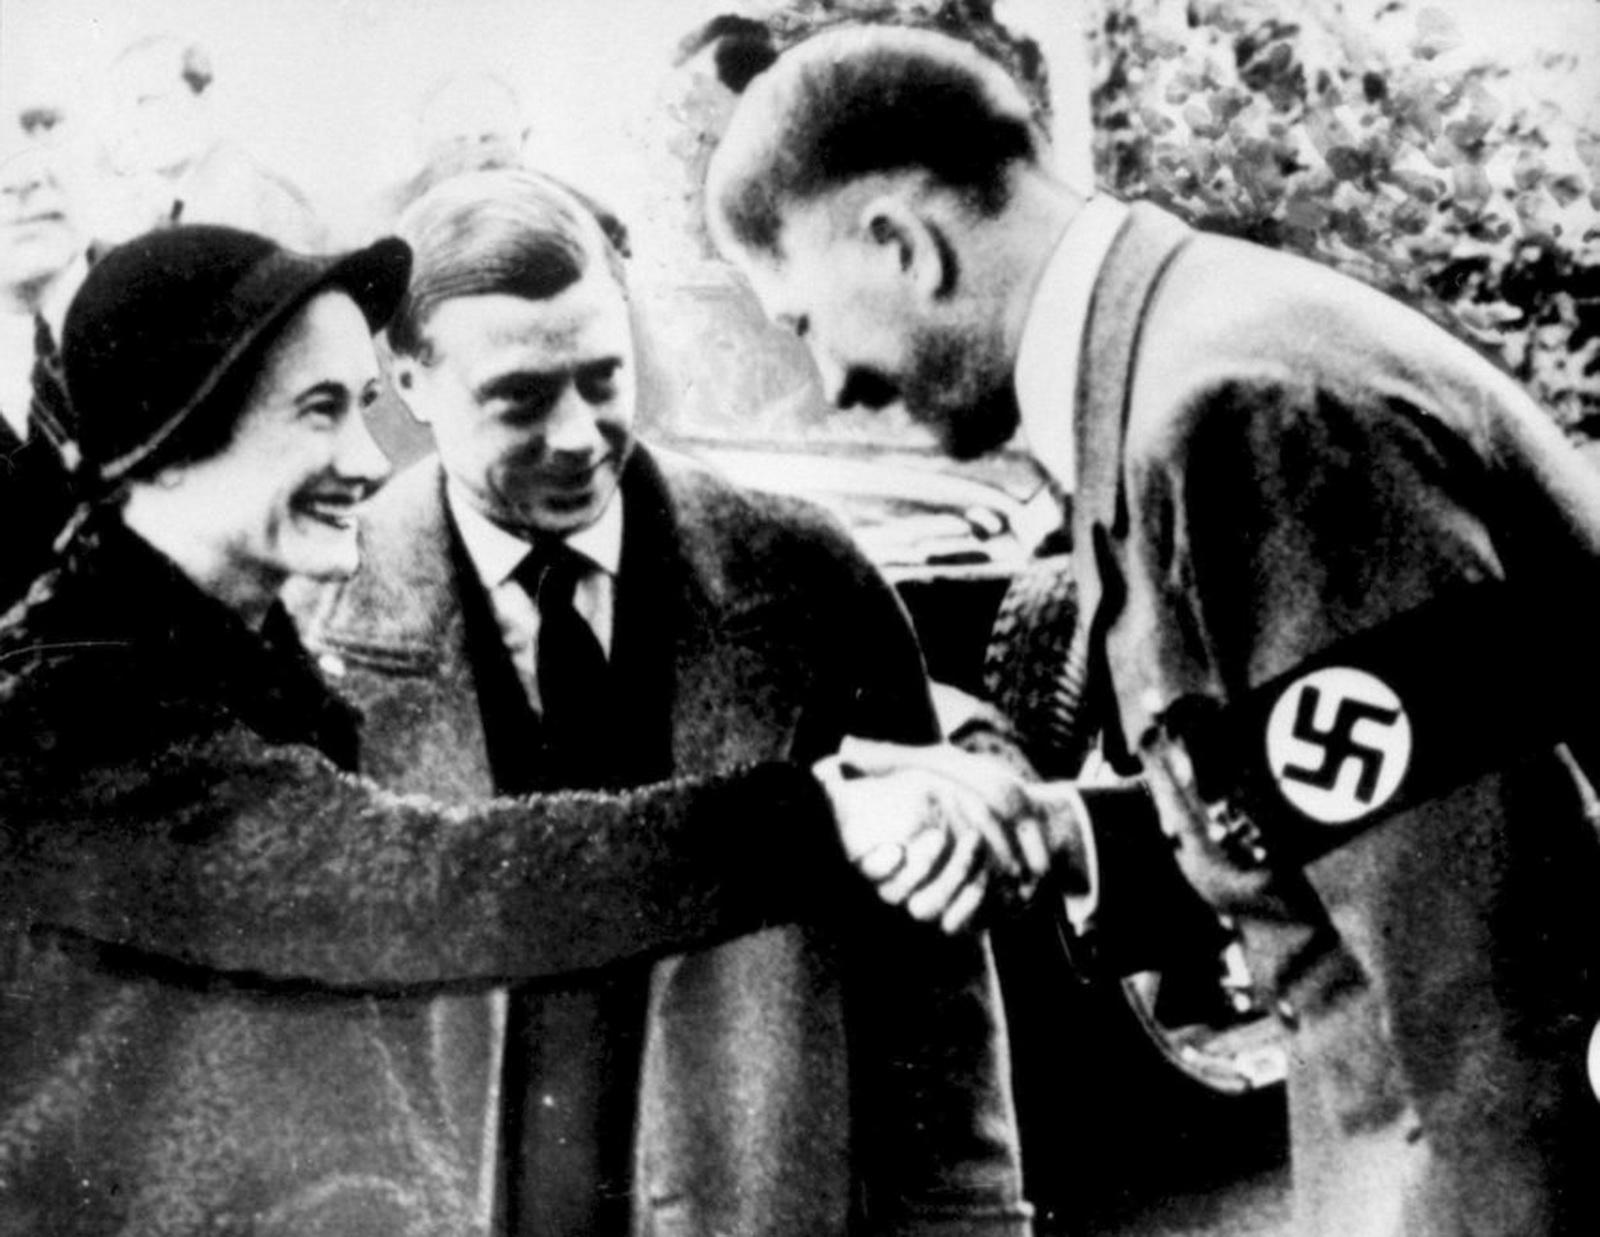 Edward VIII and Hitler